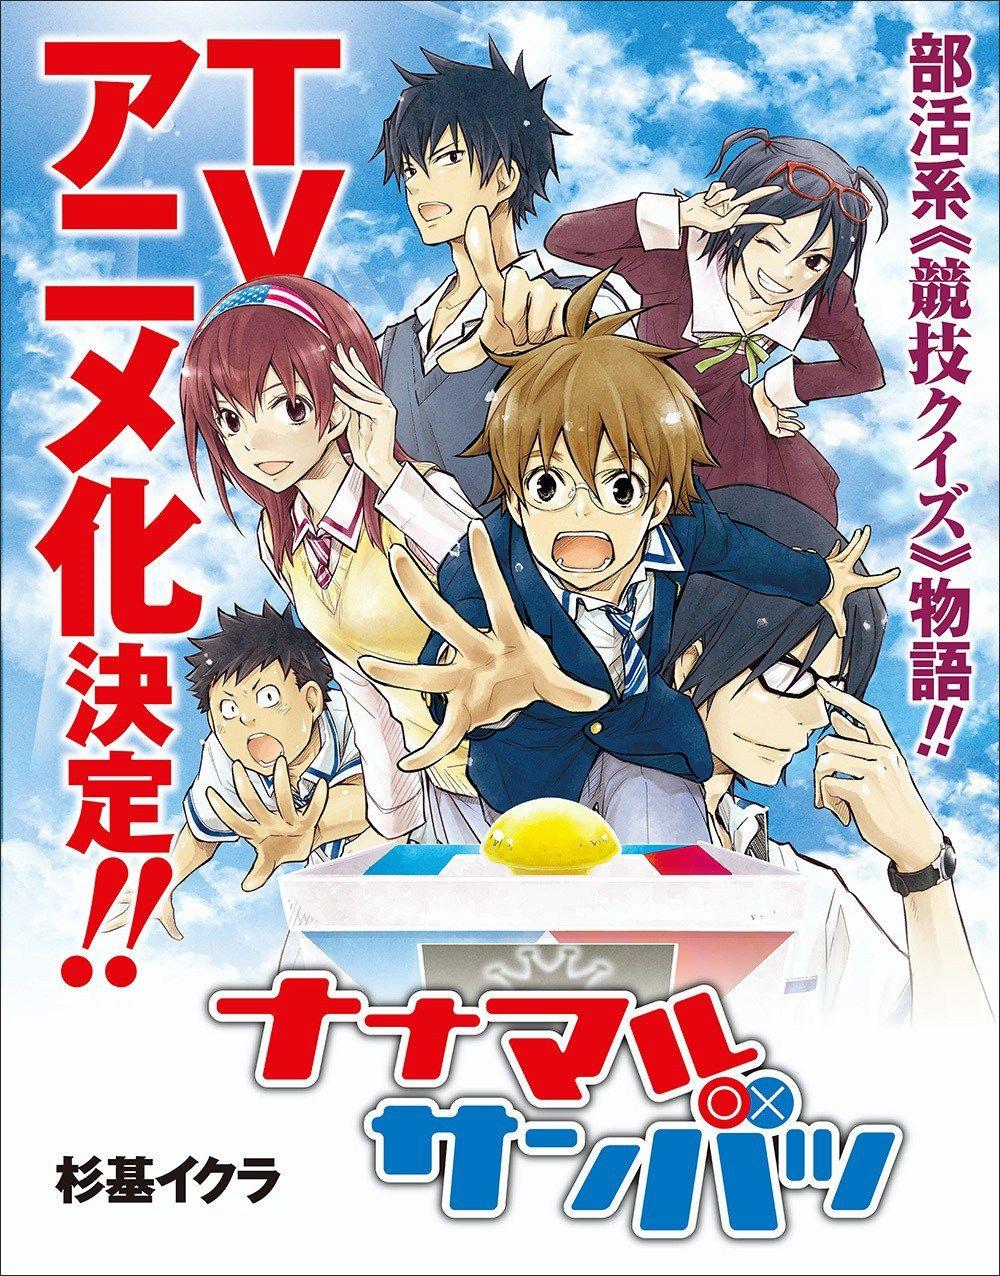 Nana maru san batsu manga anime anime stories anime